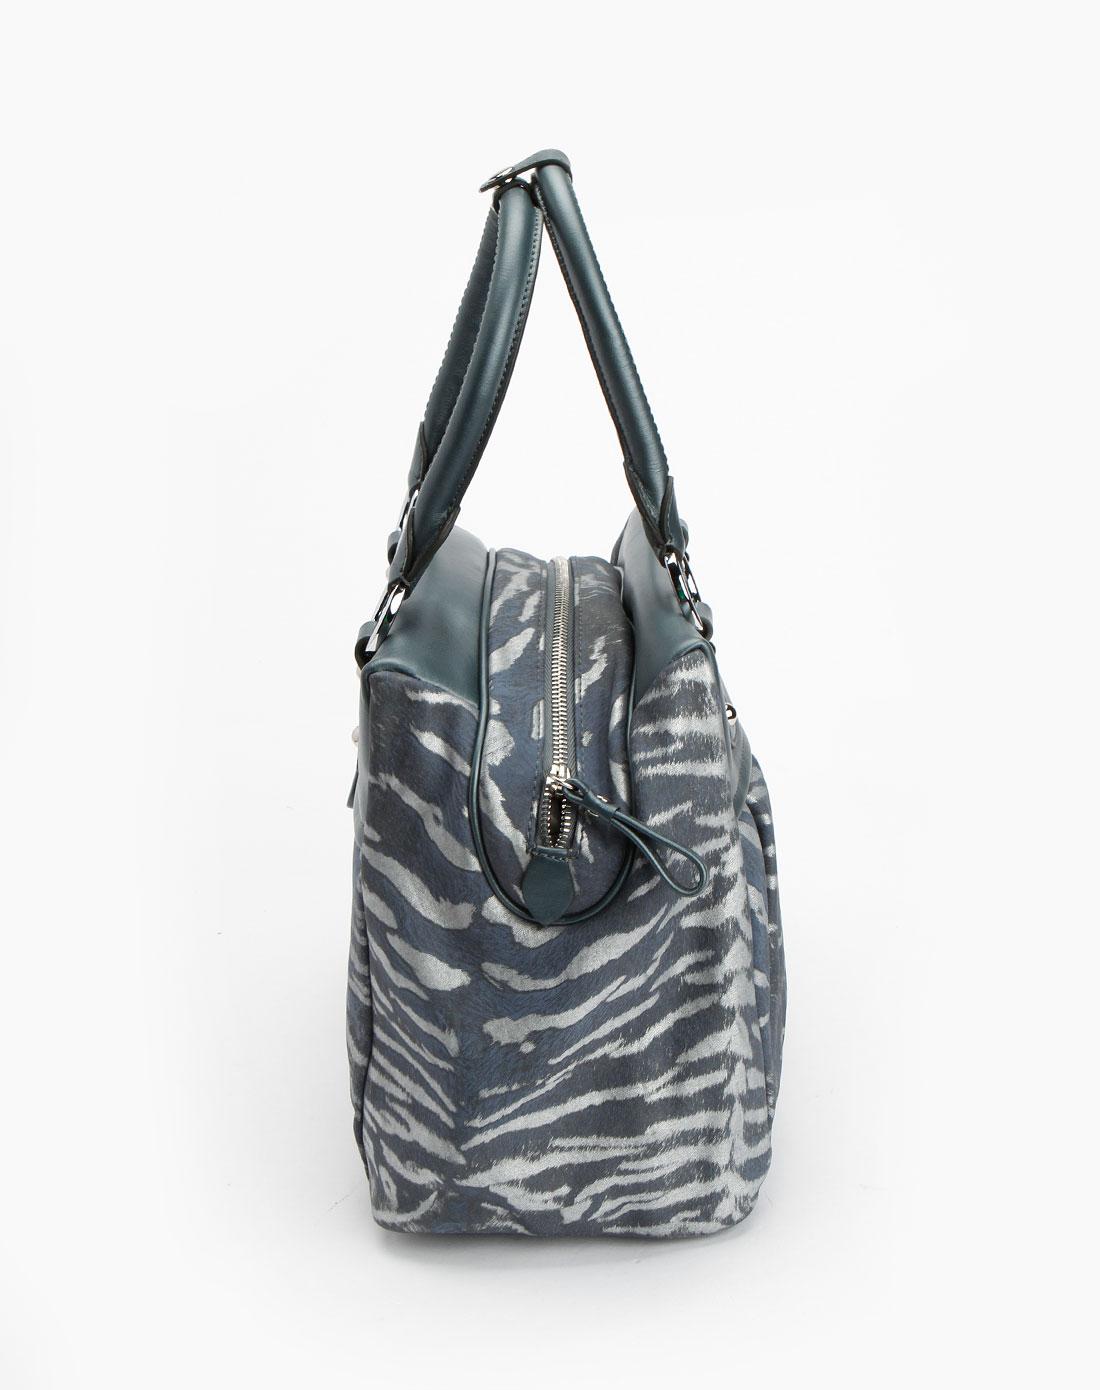 glusre蓝灰/银色印纹手提包